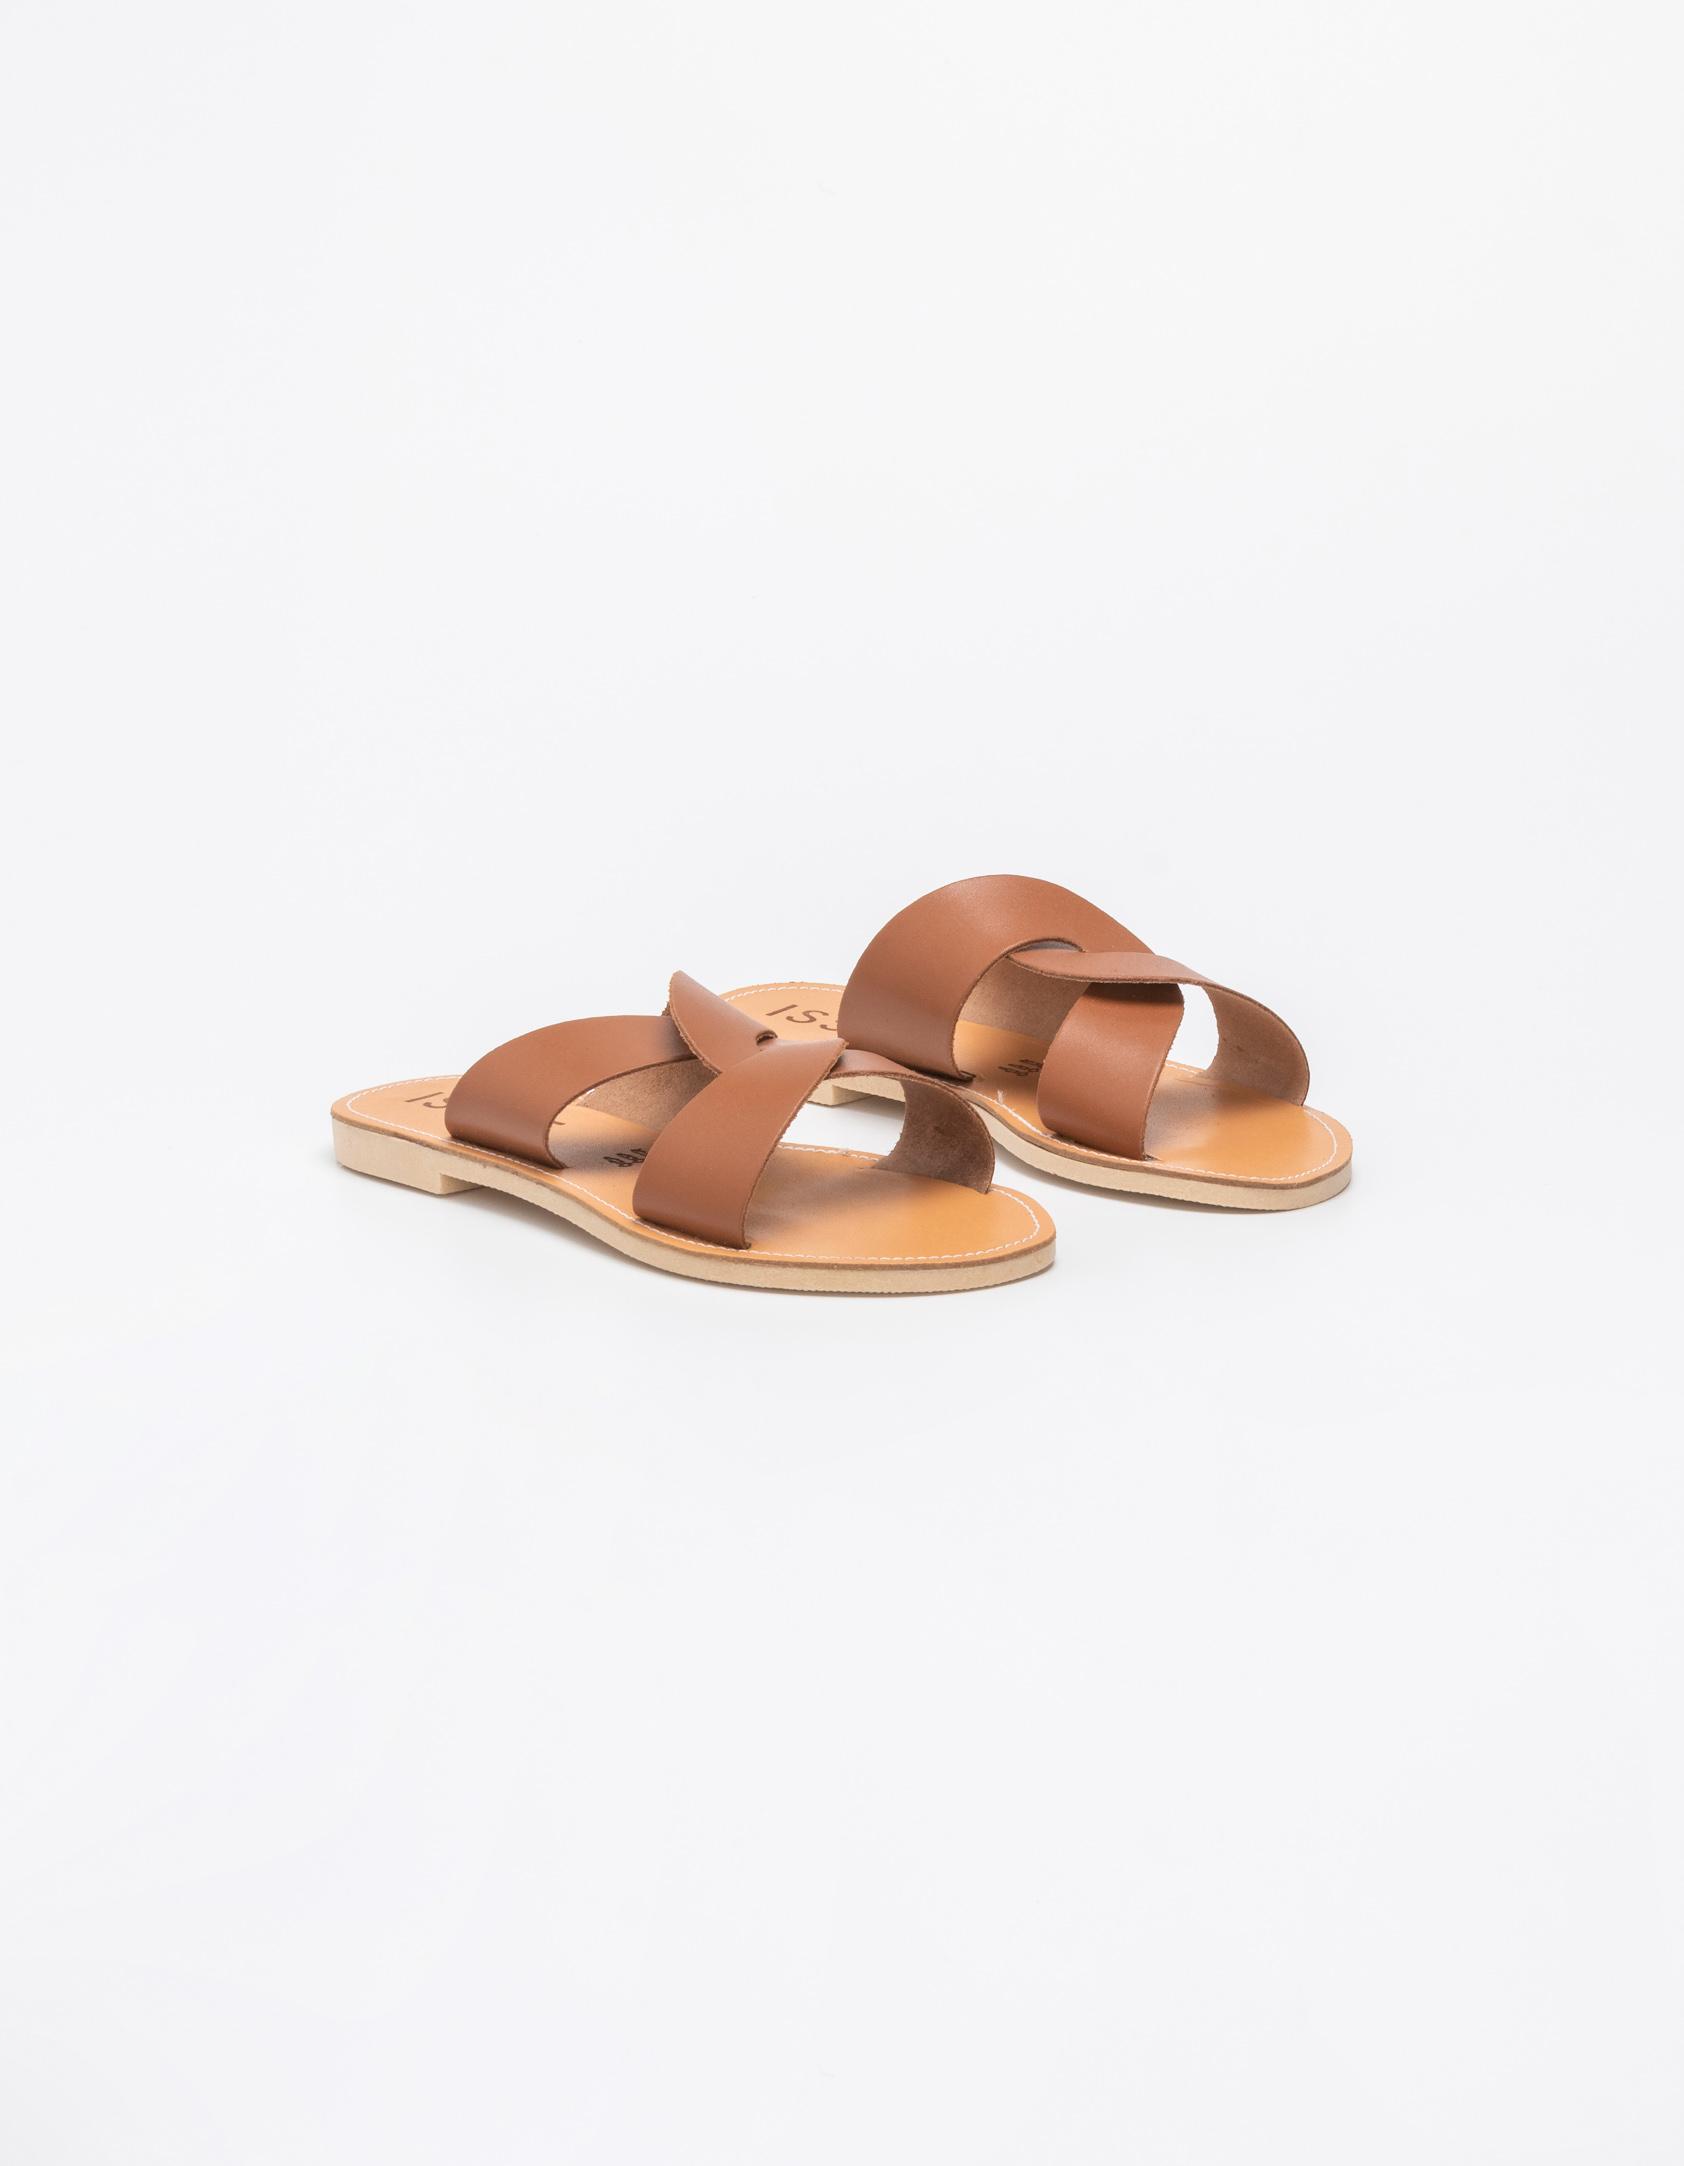 c2557767376 Flat σανδάλια με λοξές φάσες - Issue Fashion